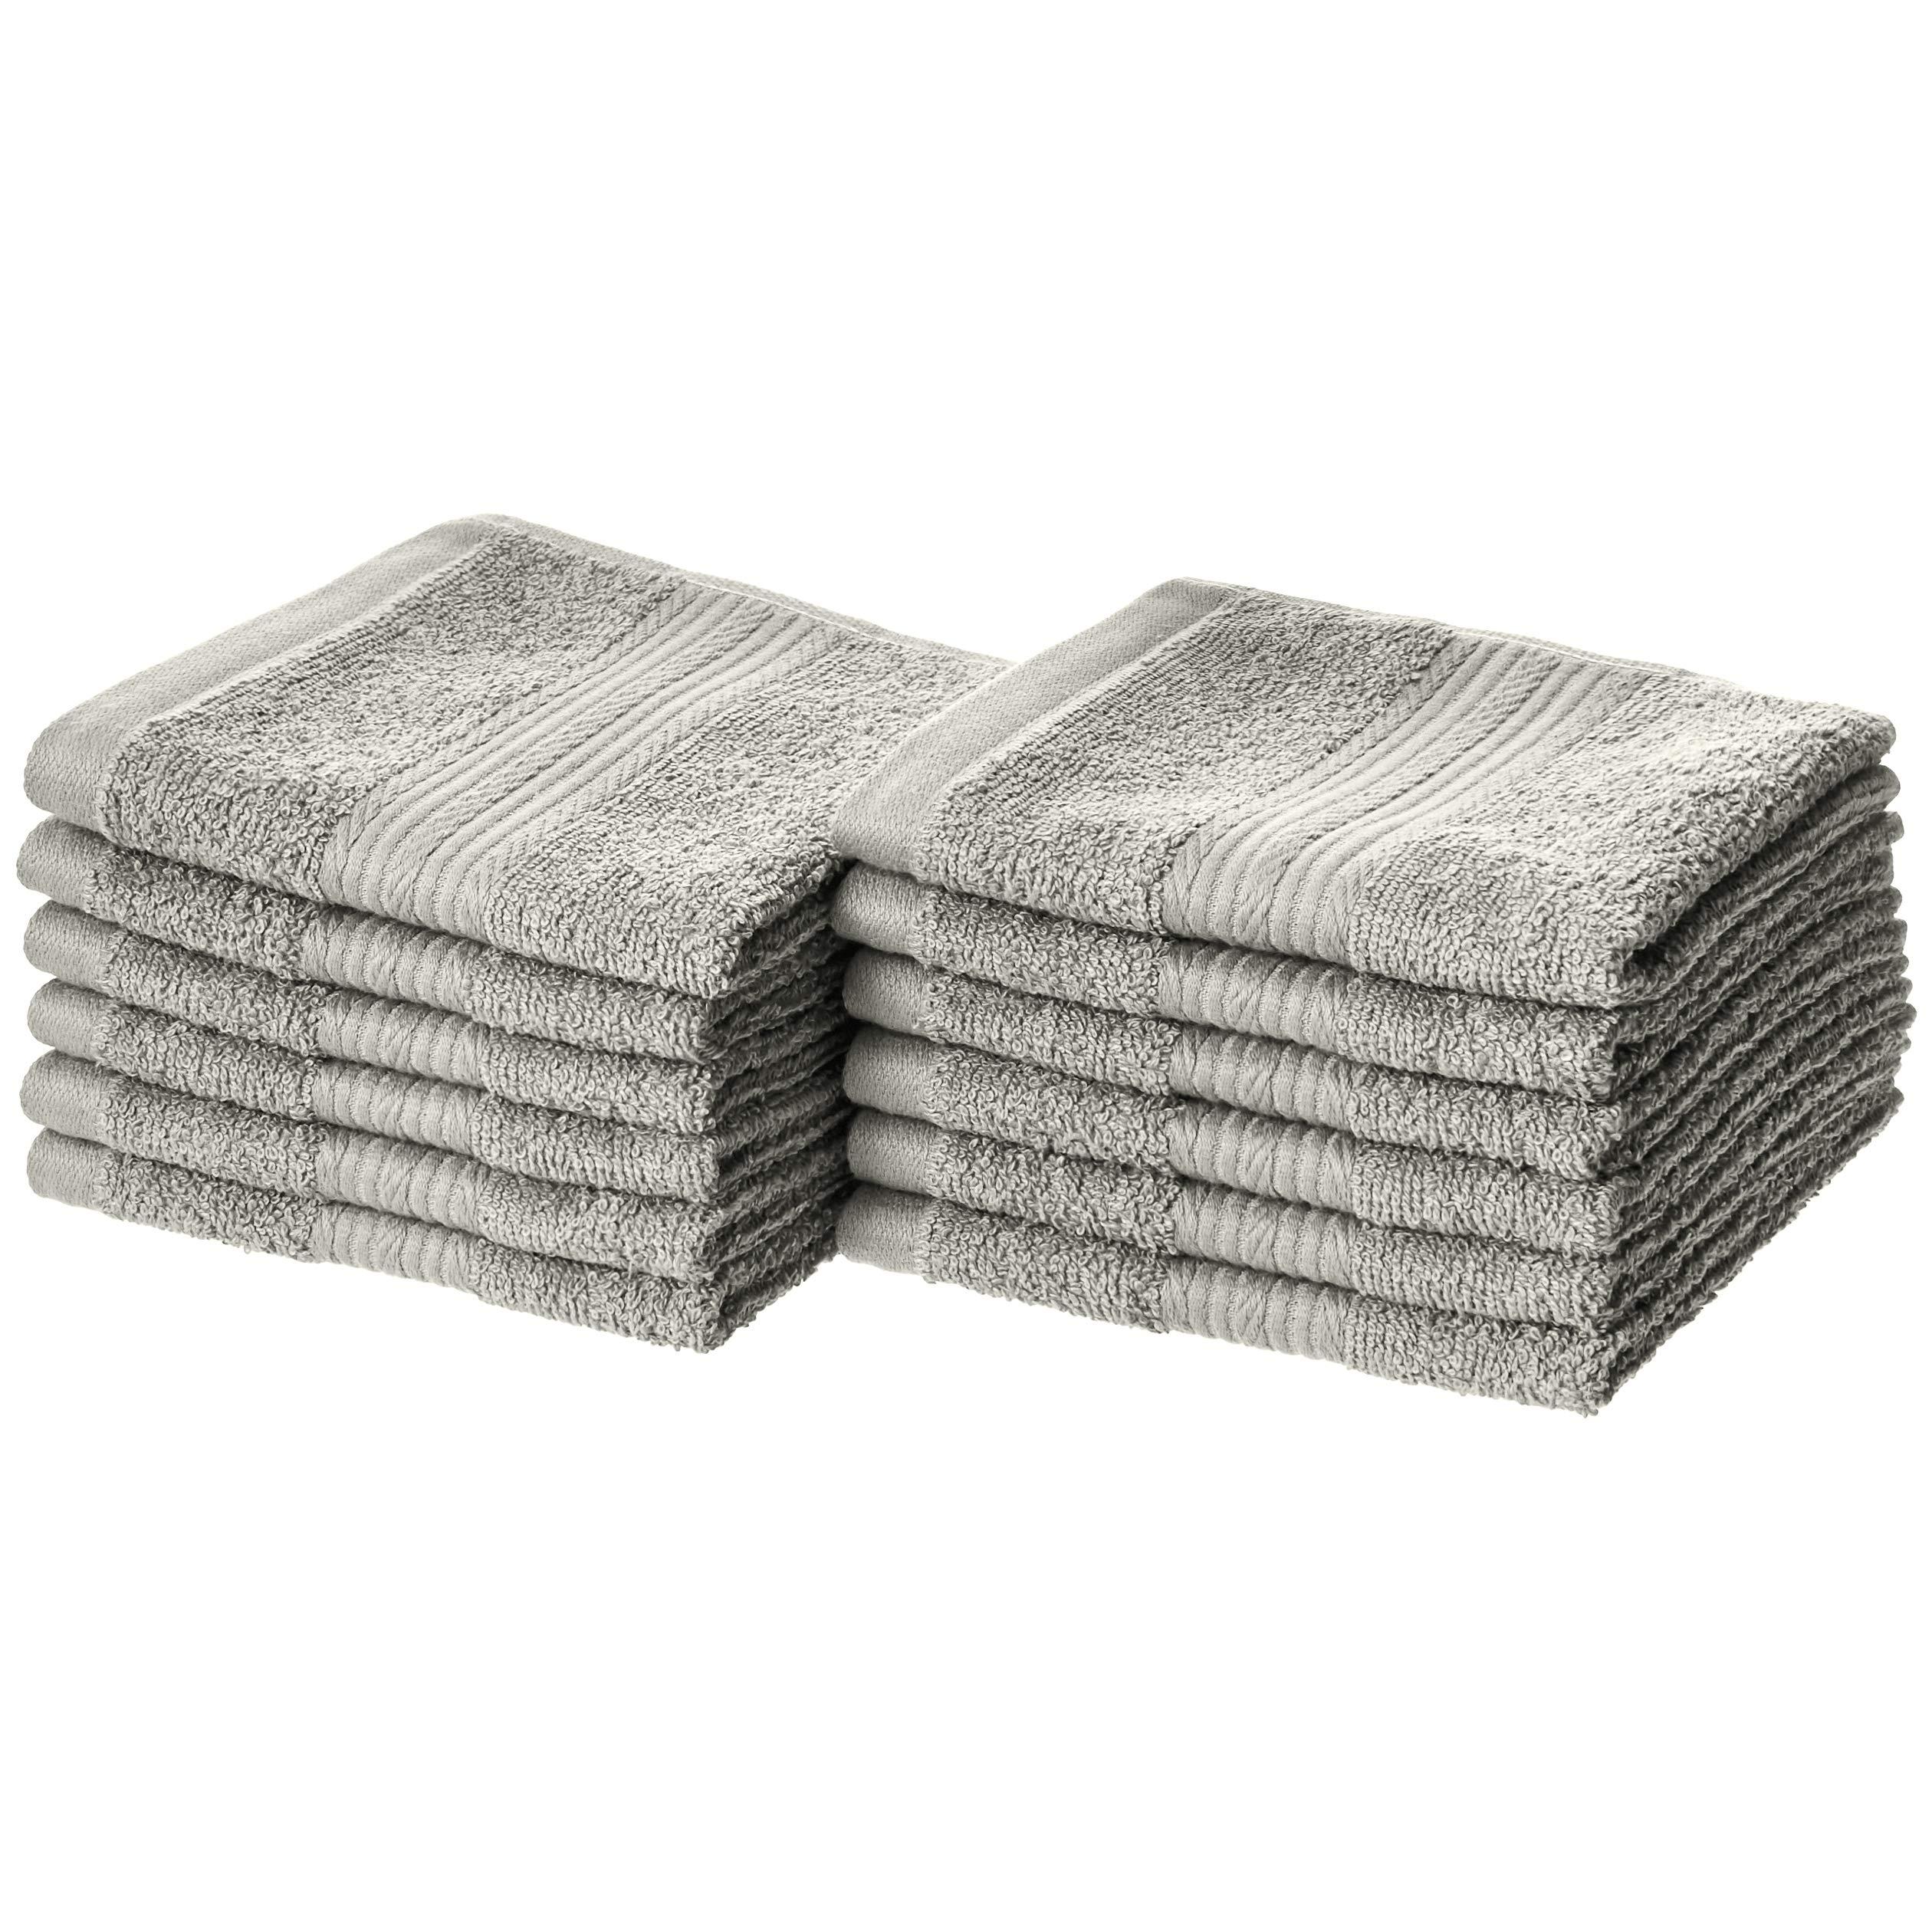 AmazonBasics Fade-Resistant Cotton Washcloths - Pack of 12, Grey